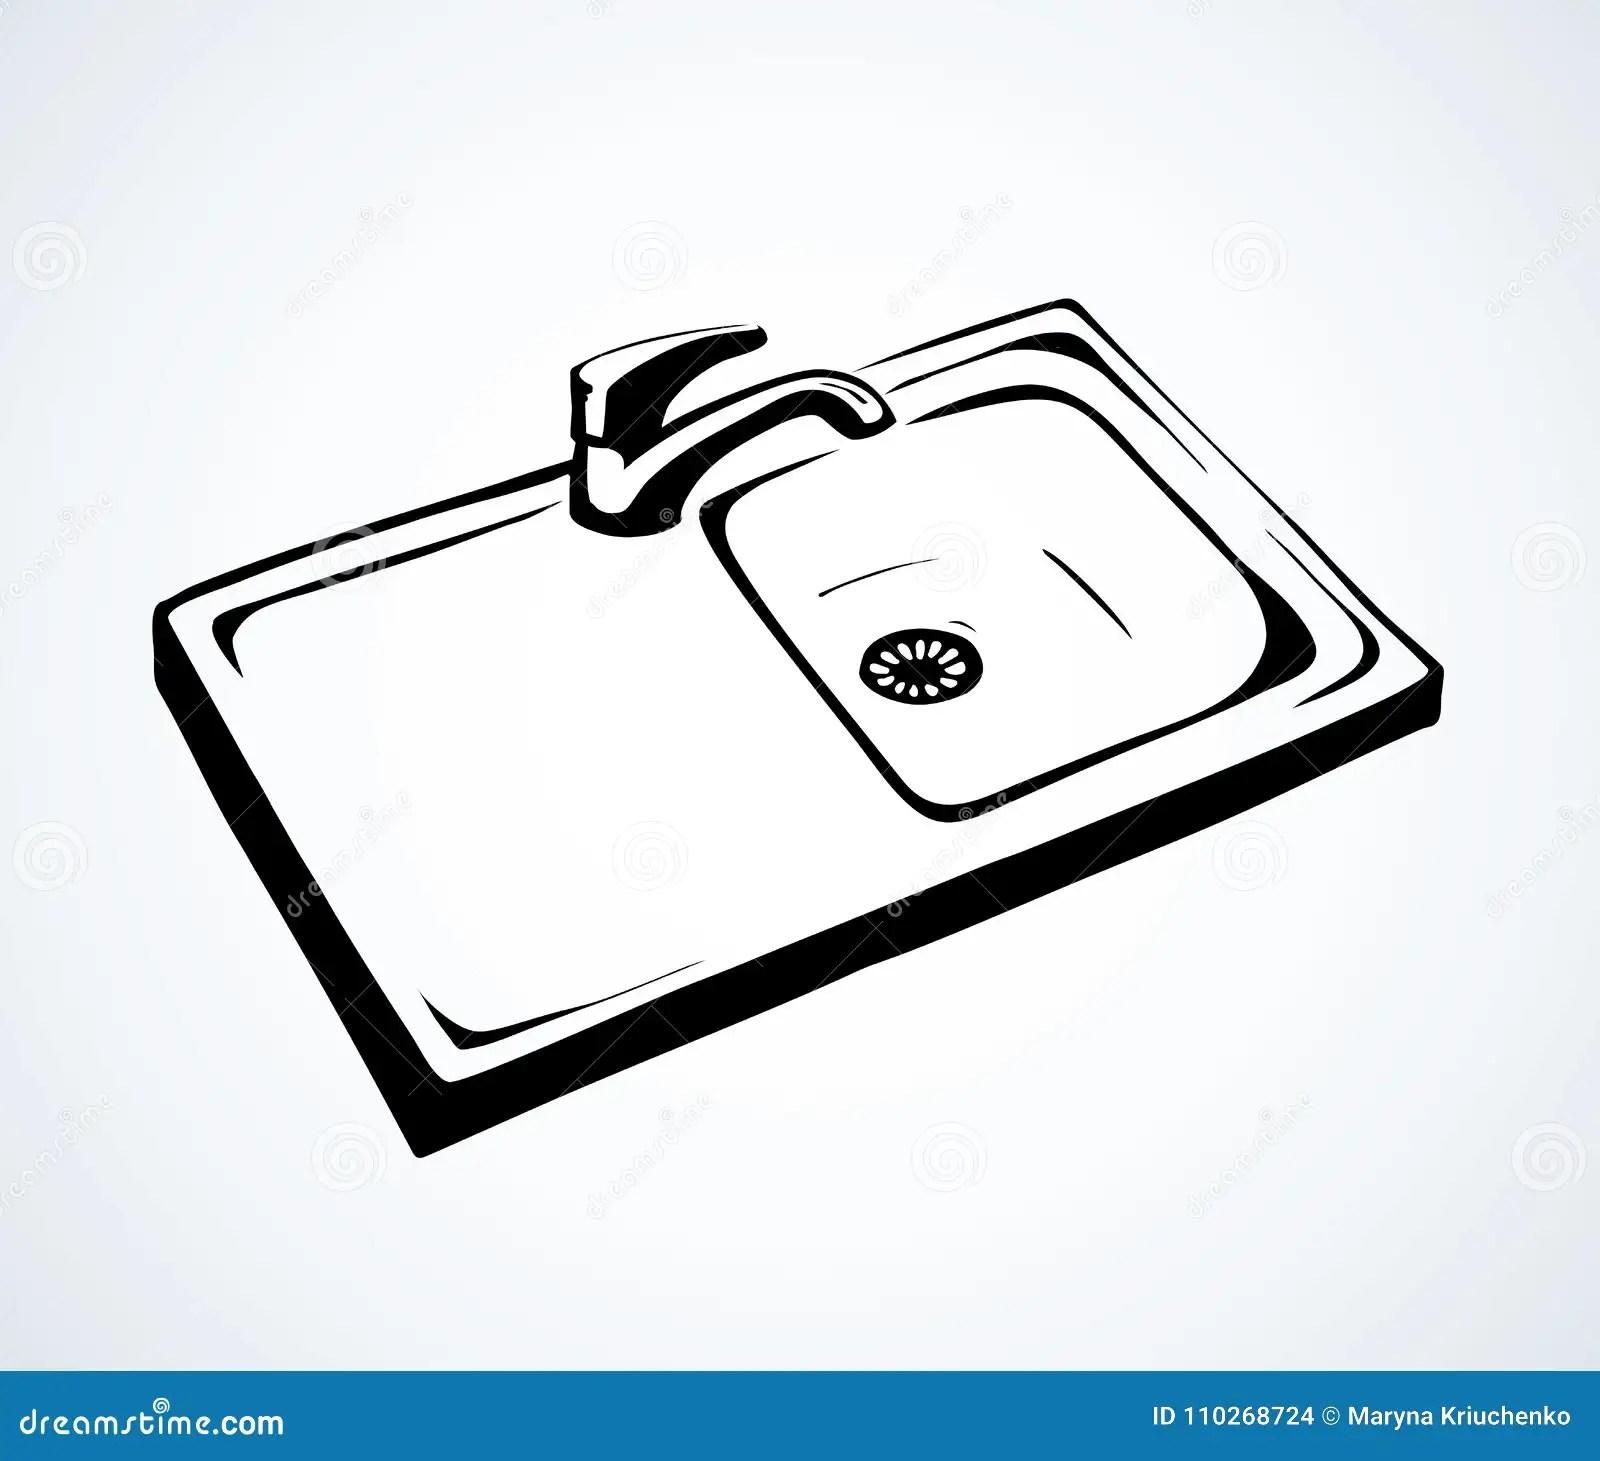 kitchen art prints shaker style cabinet hardware 剪报文件包括厨房路径水槽得出花卉草向量的背景向量例证 插画包括有排水 在白色凹进处工作台面背景的新的镀铬物插座drainhole 在减速火箭的艺术conour动画片印刷品 样式的黑暗的贷方手拉的对象象征图表剪影与空间的特写镜头顶视图文本的